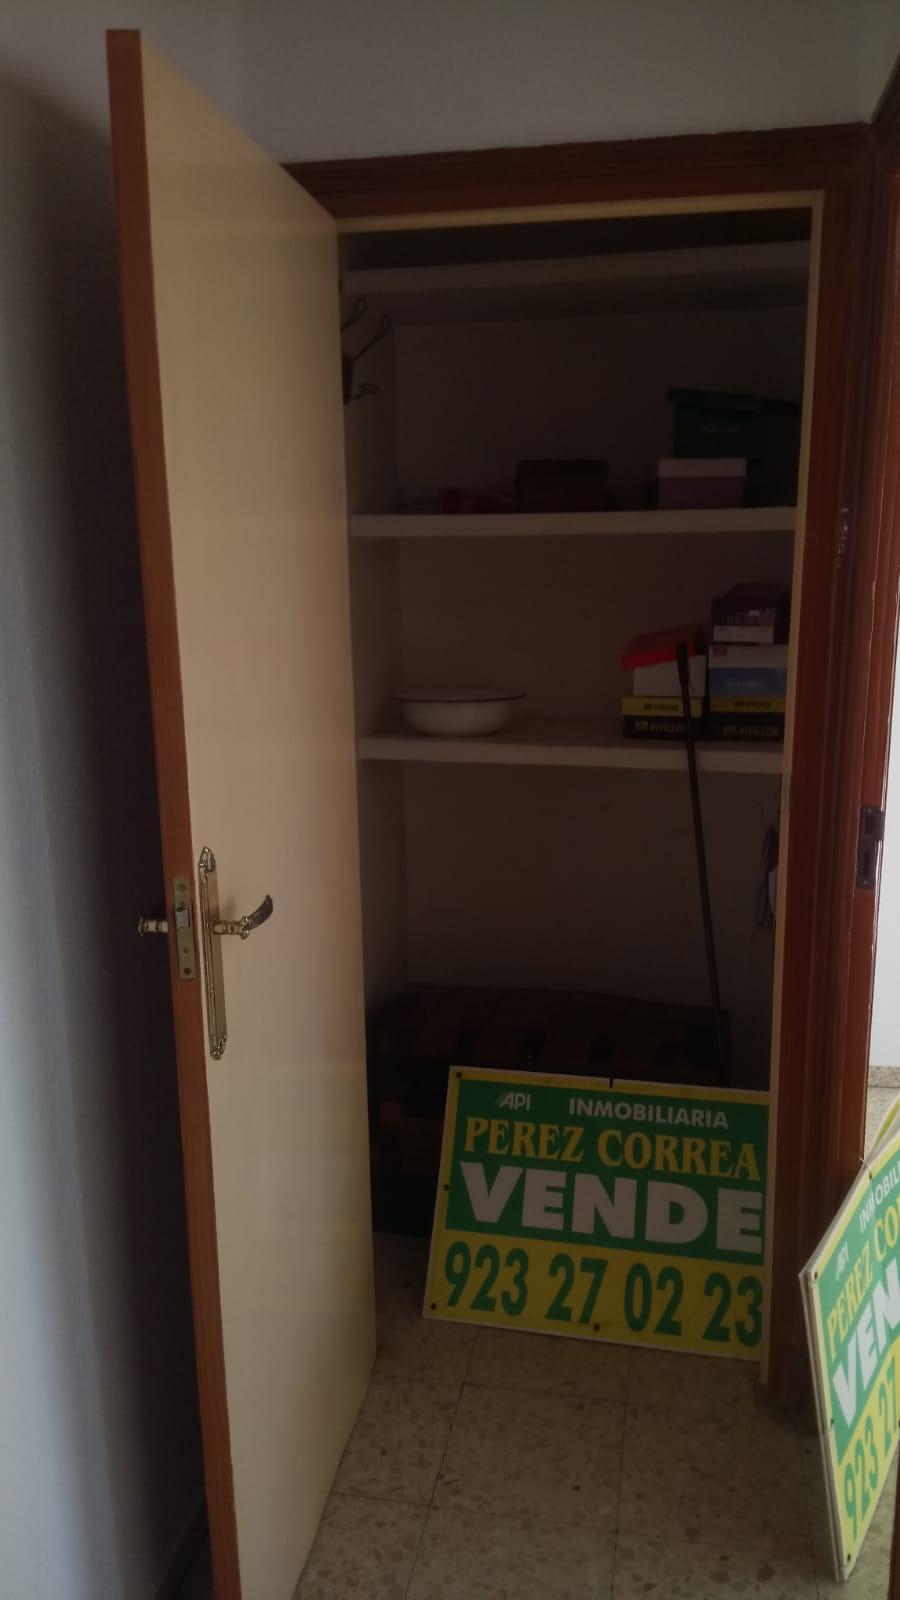 PISO EN CALLE TOLDEDO ESQUINA AVENIDA PORTUGAL (REF: 5) - foto 8 20190125014005_dc0e1bc1-ee54-4620-b3bc-c65d2b2d4e05.jpg